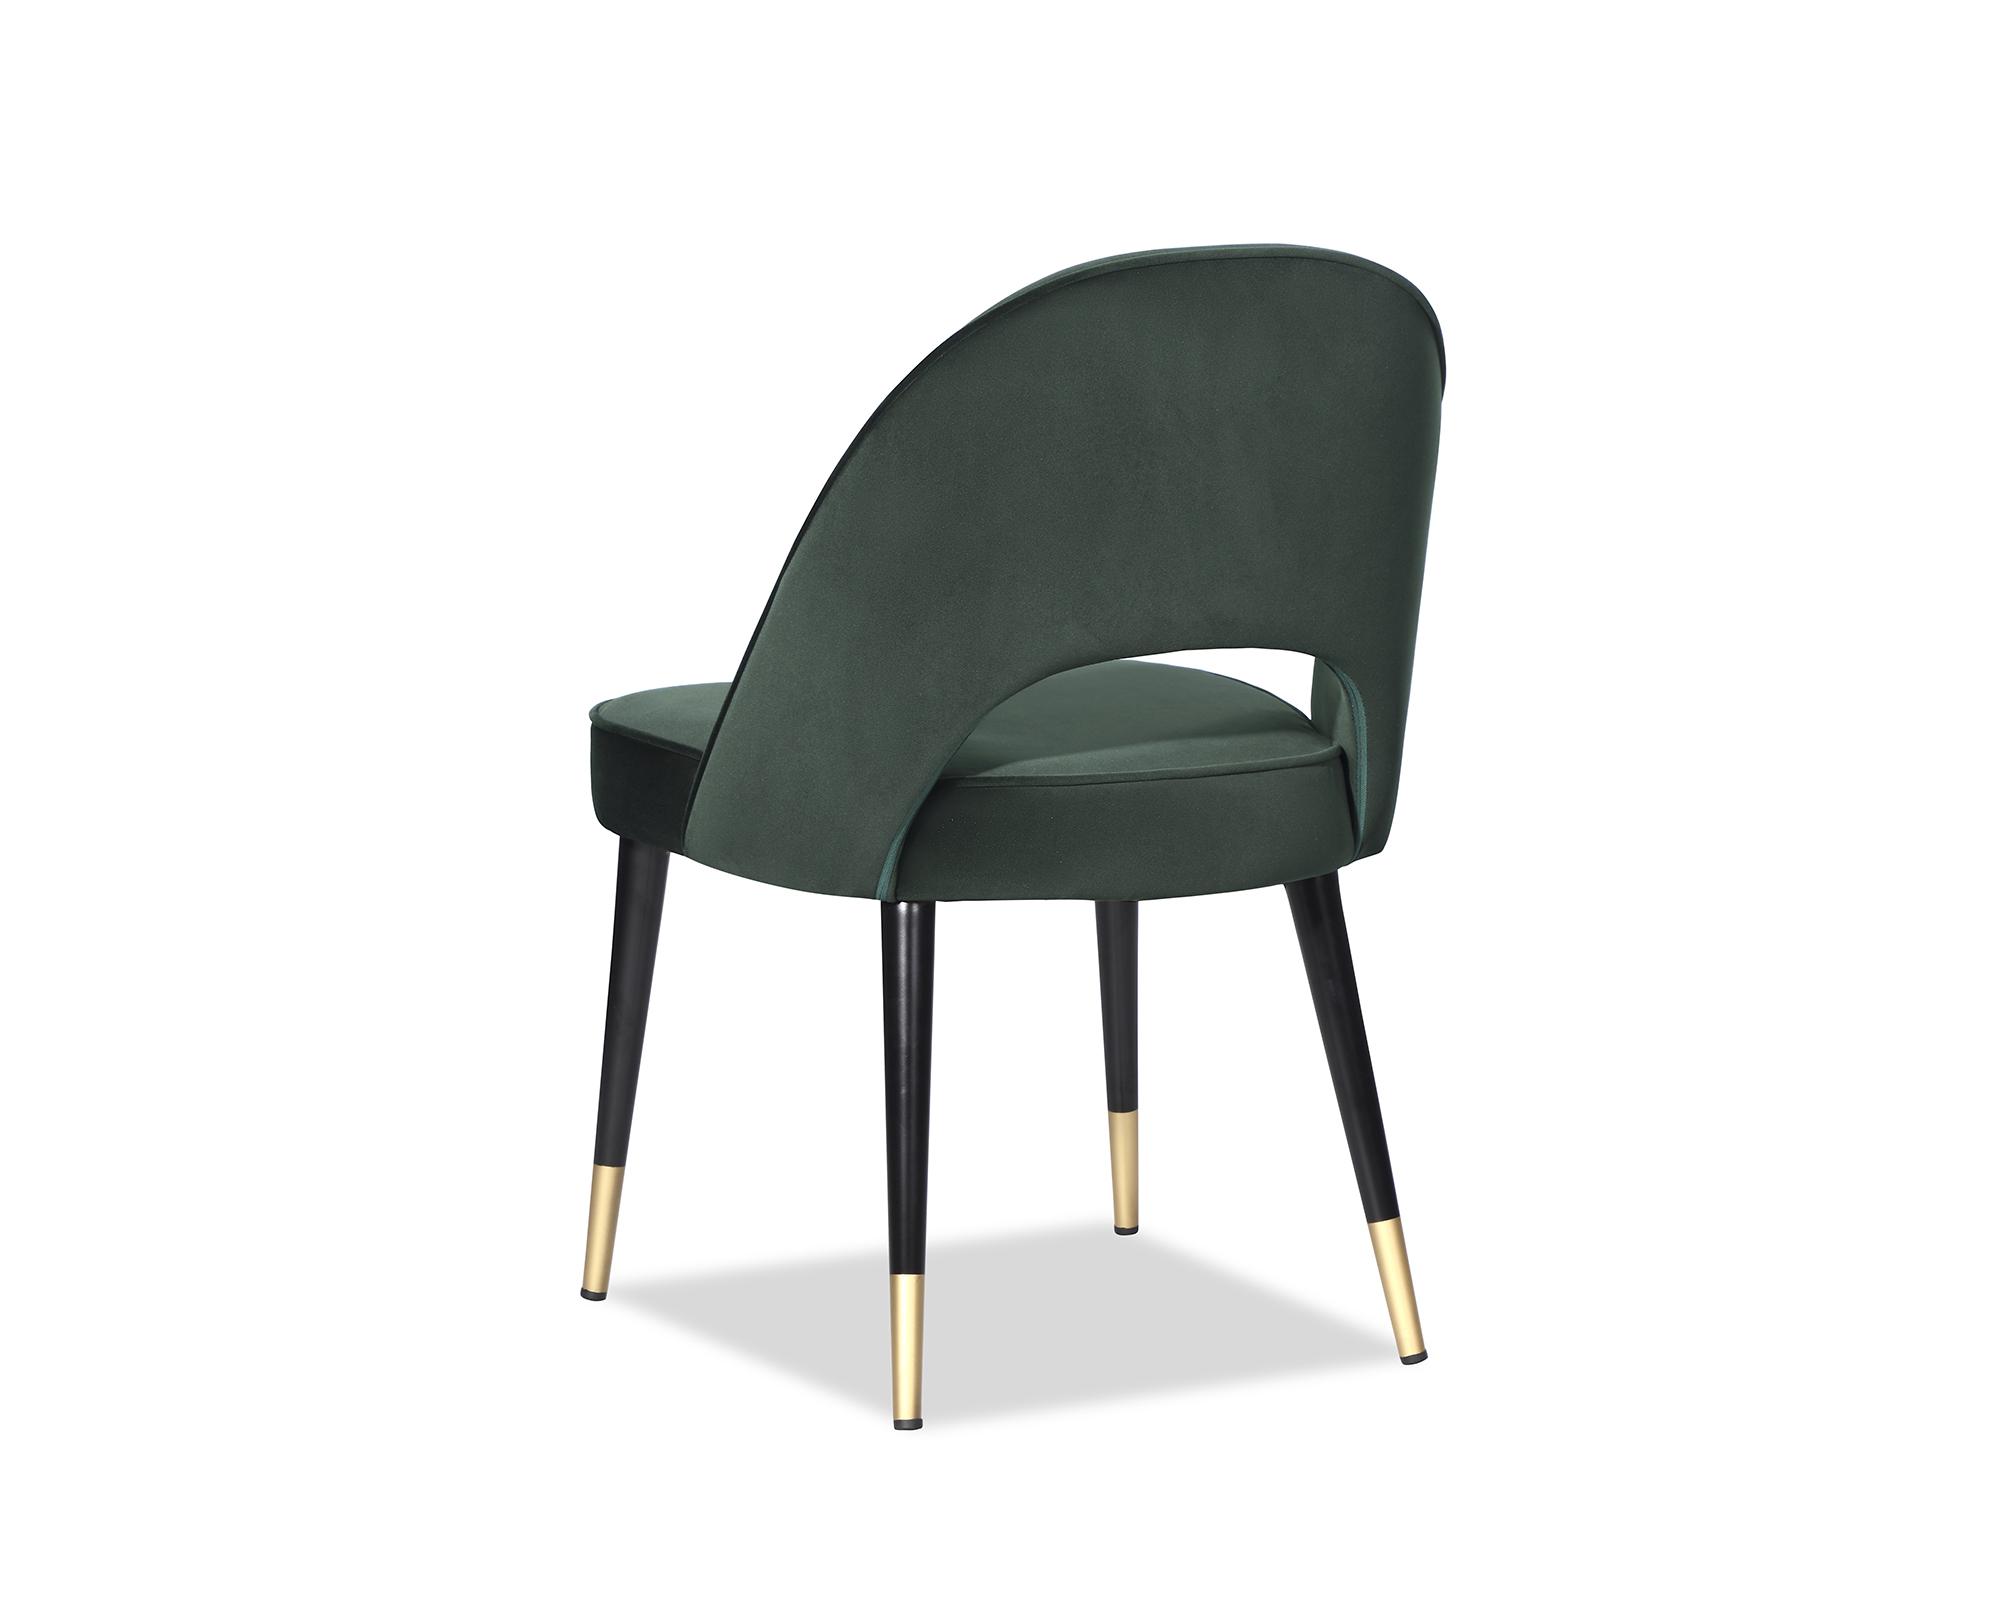 Liang & Eimil GV-DCH-006 Yvees Chair (3)